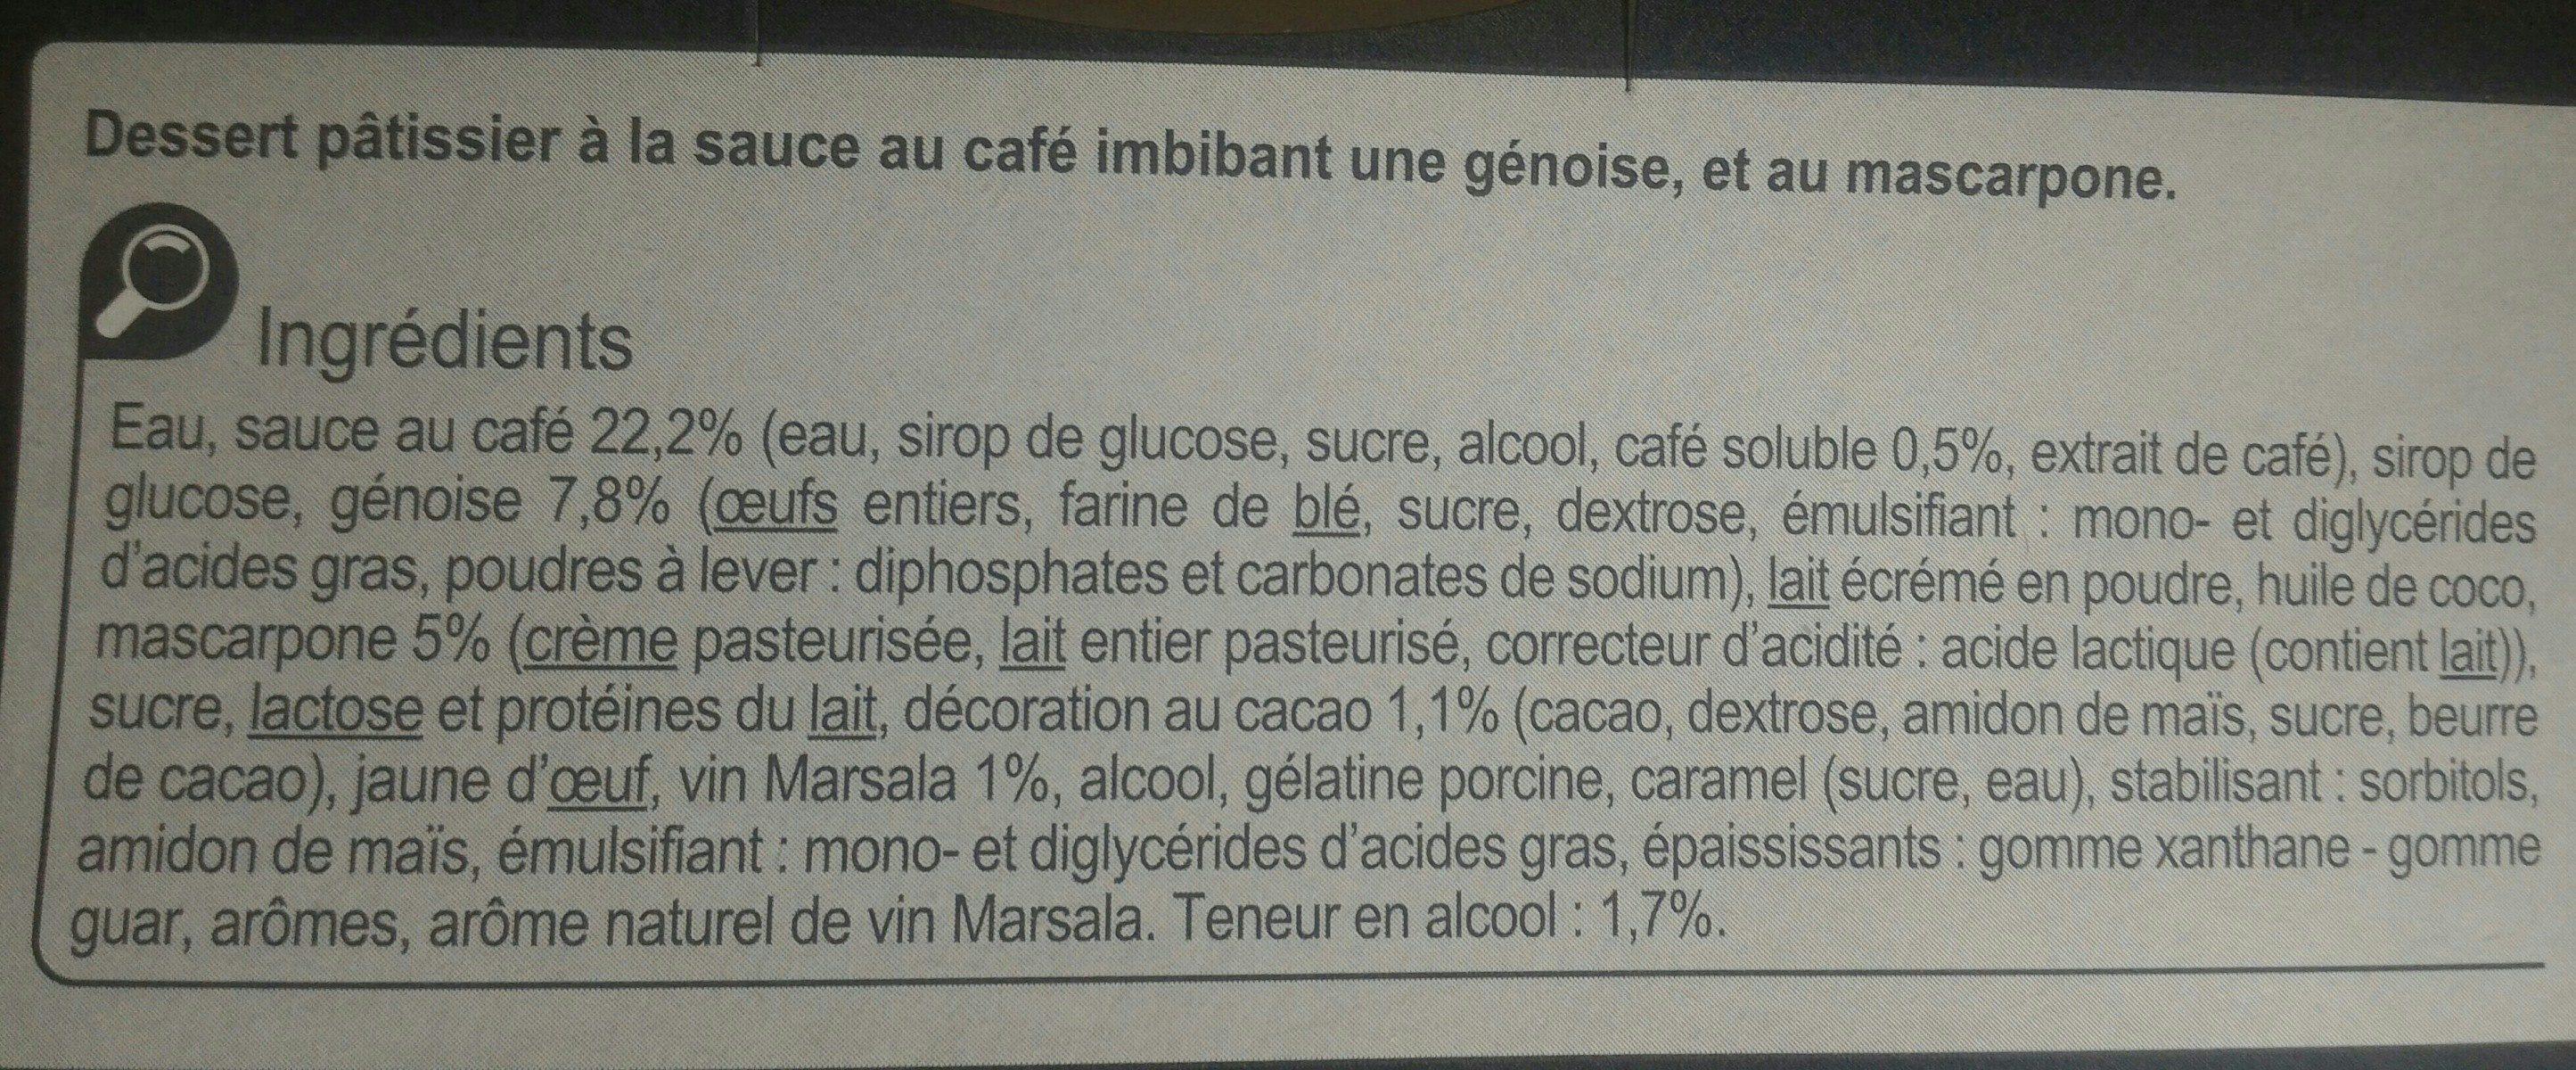 Le Tiramisu - Ingrédients - fr